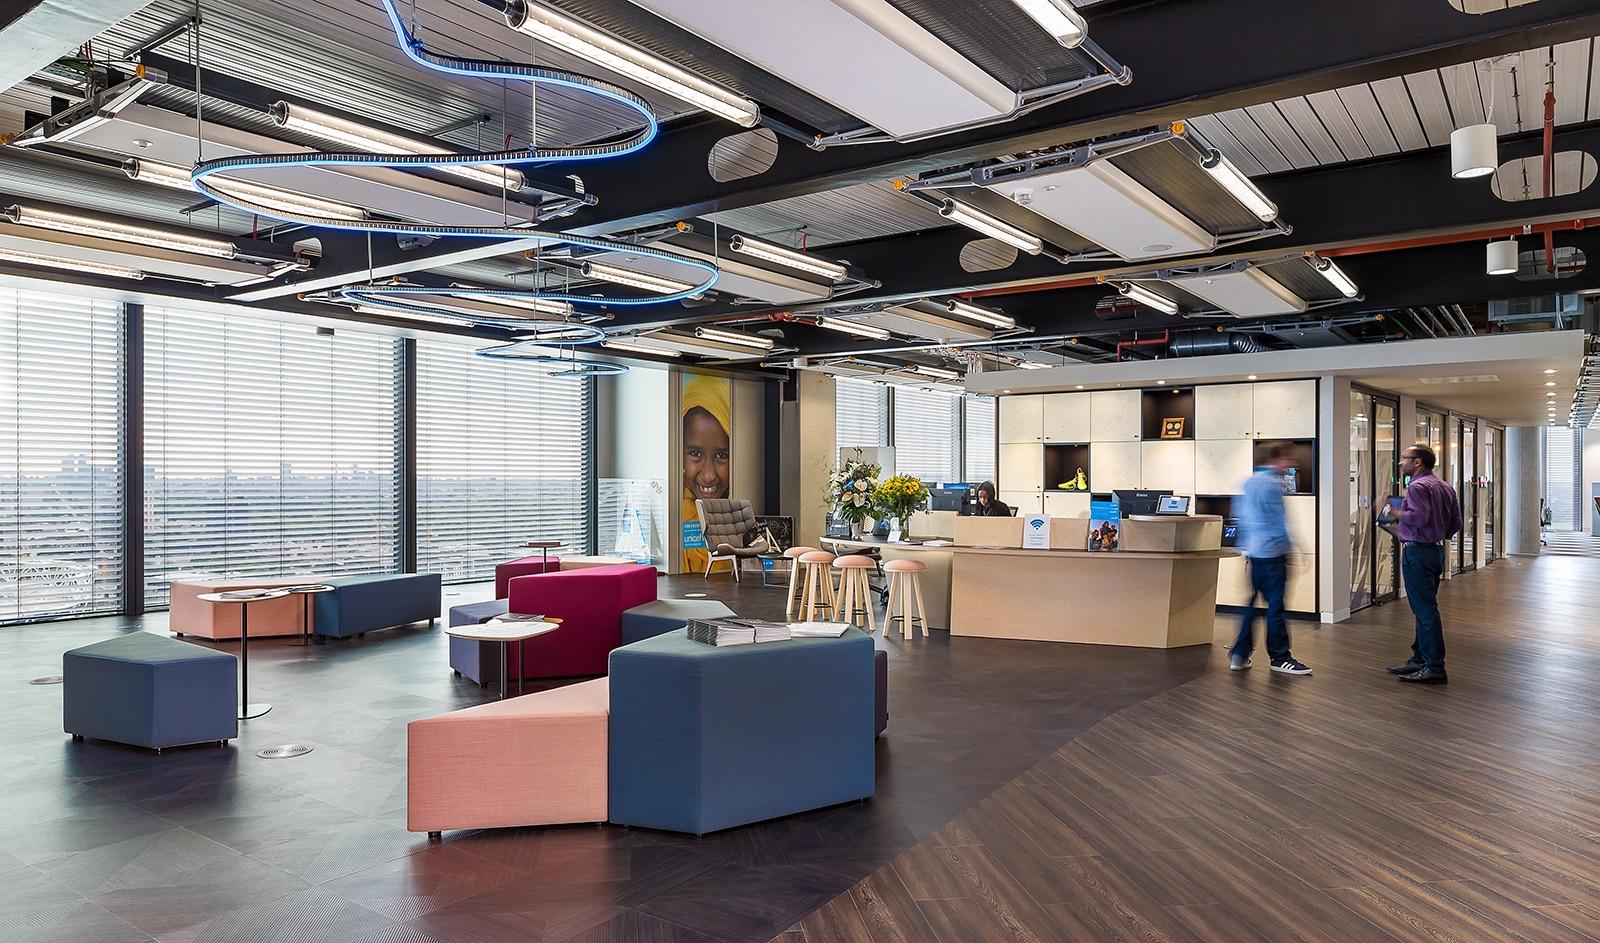 unicef-london-office-1